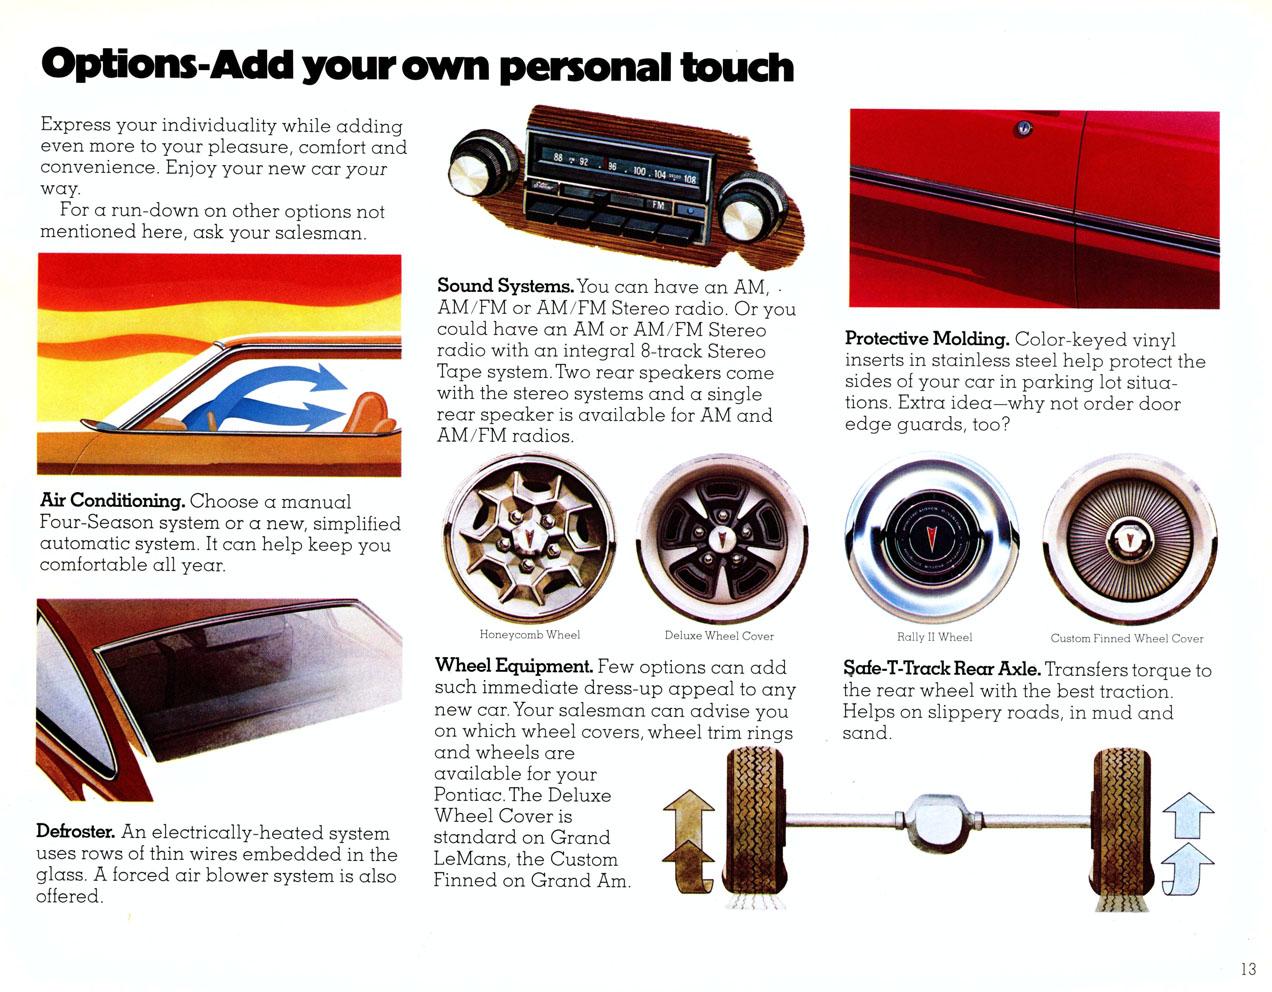 1975_Pontiac_LeMans_Cdn-13.jpg